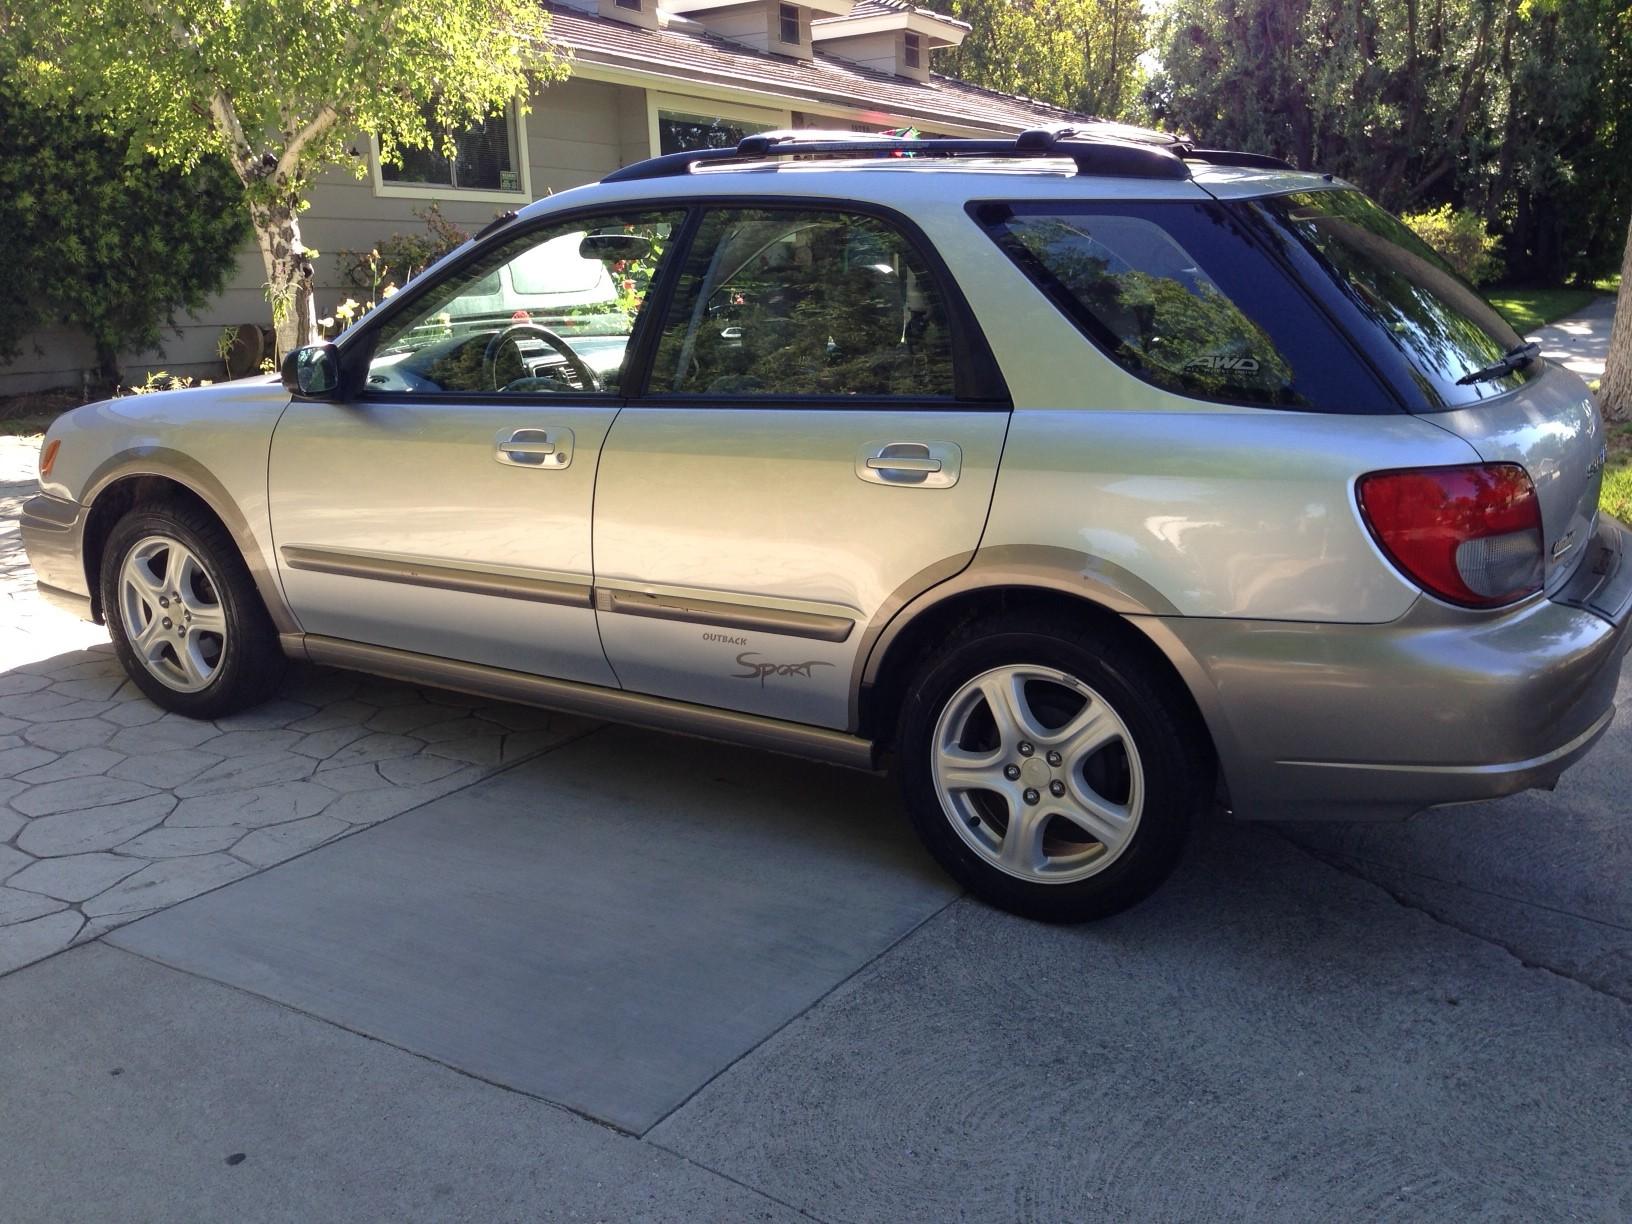 FOR SALE: 2002 Subaru Impreza -  Outback Sport AWD-subaru1.jpg